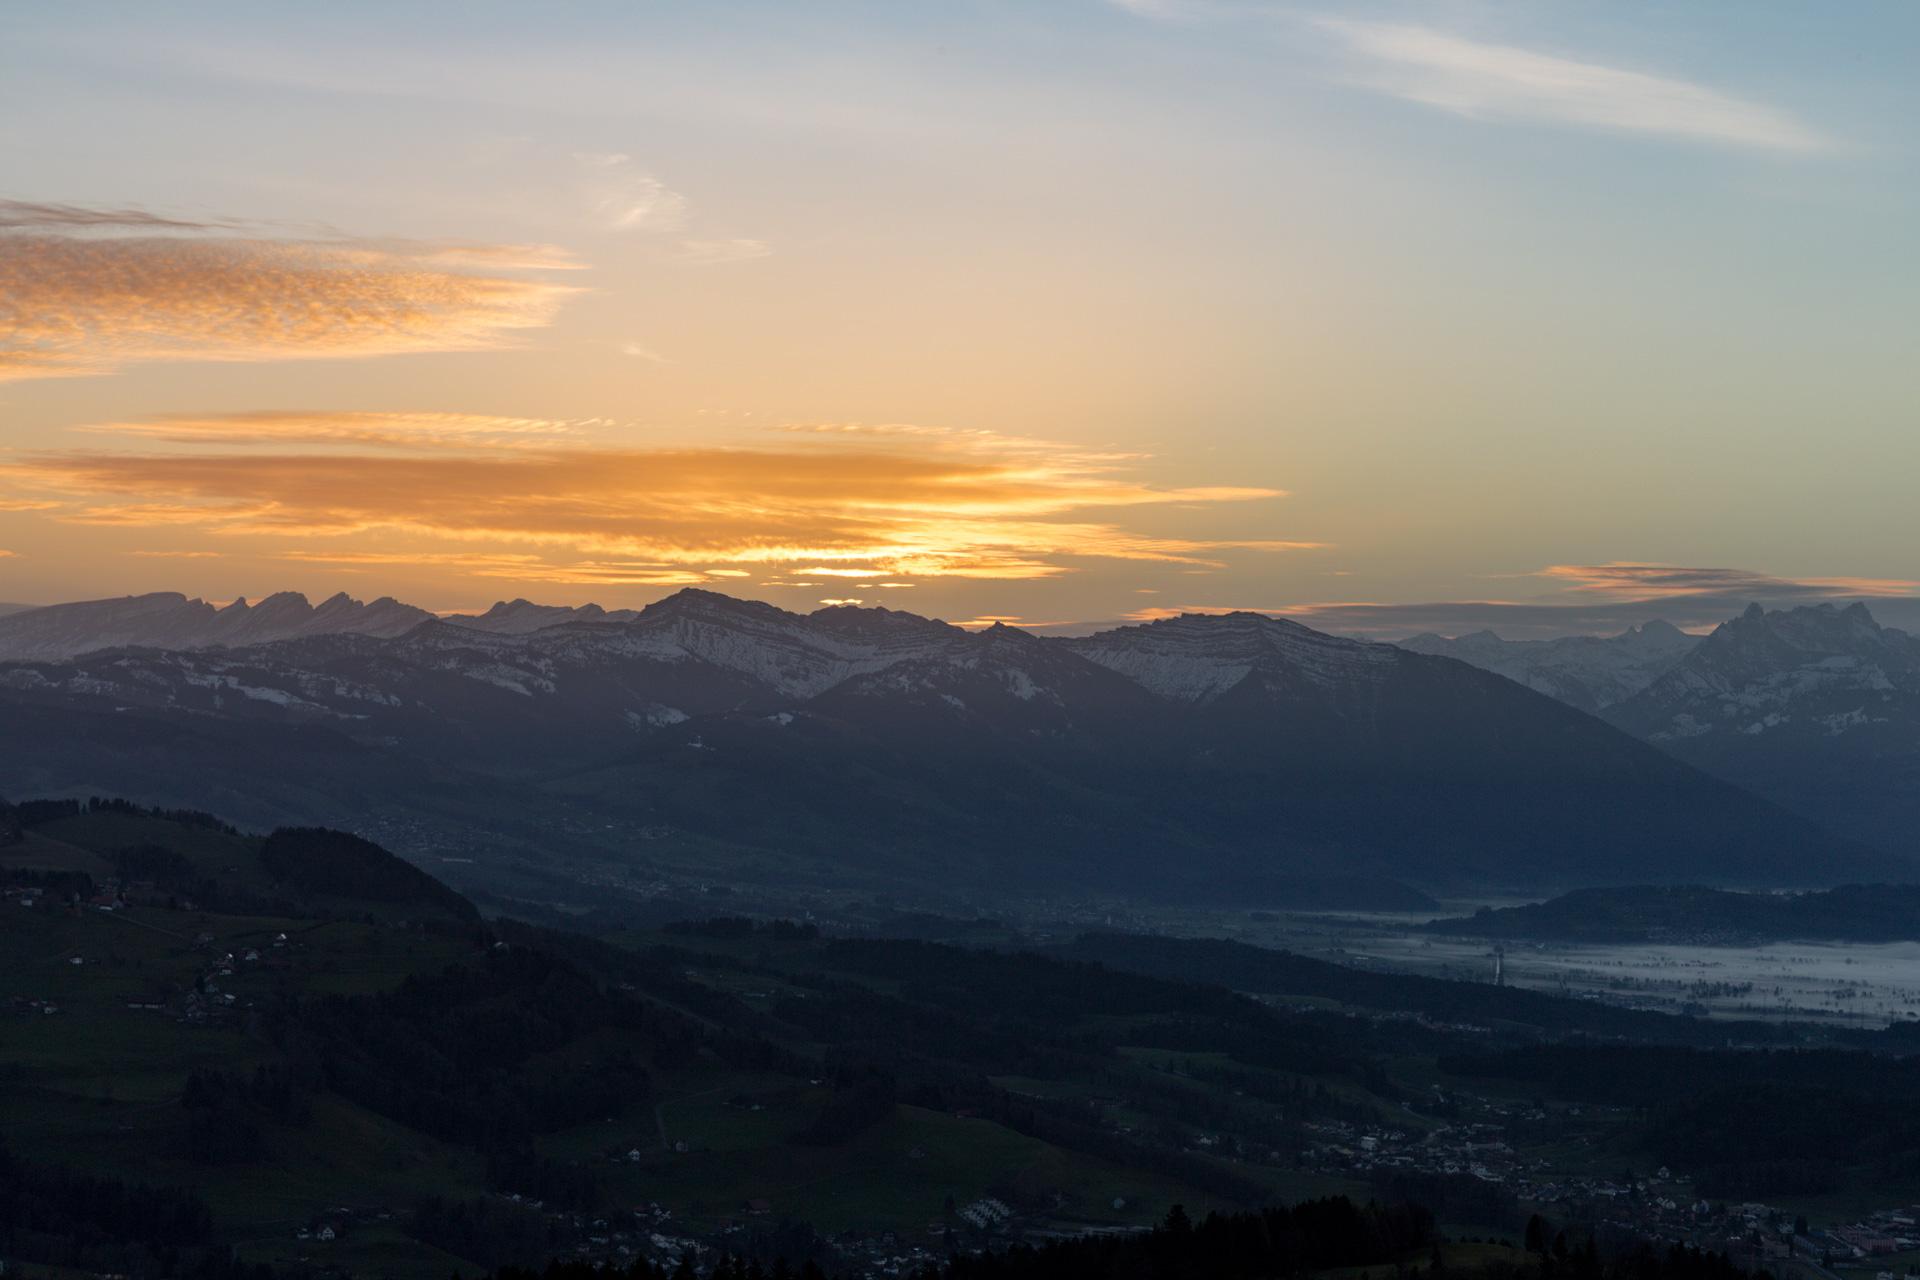 Sonnenaufgang-Bachtelturm_20151219_5929-1ebene